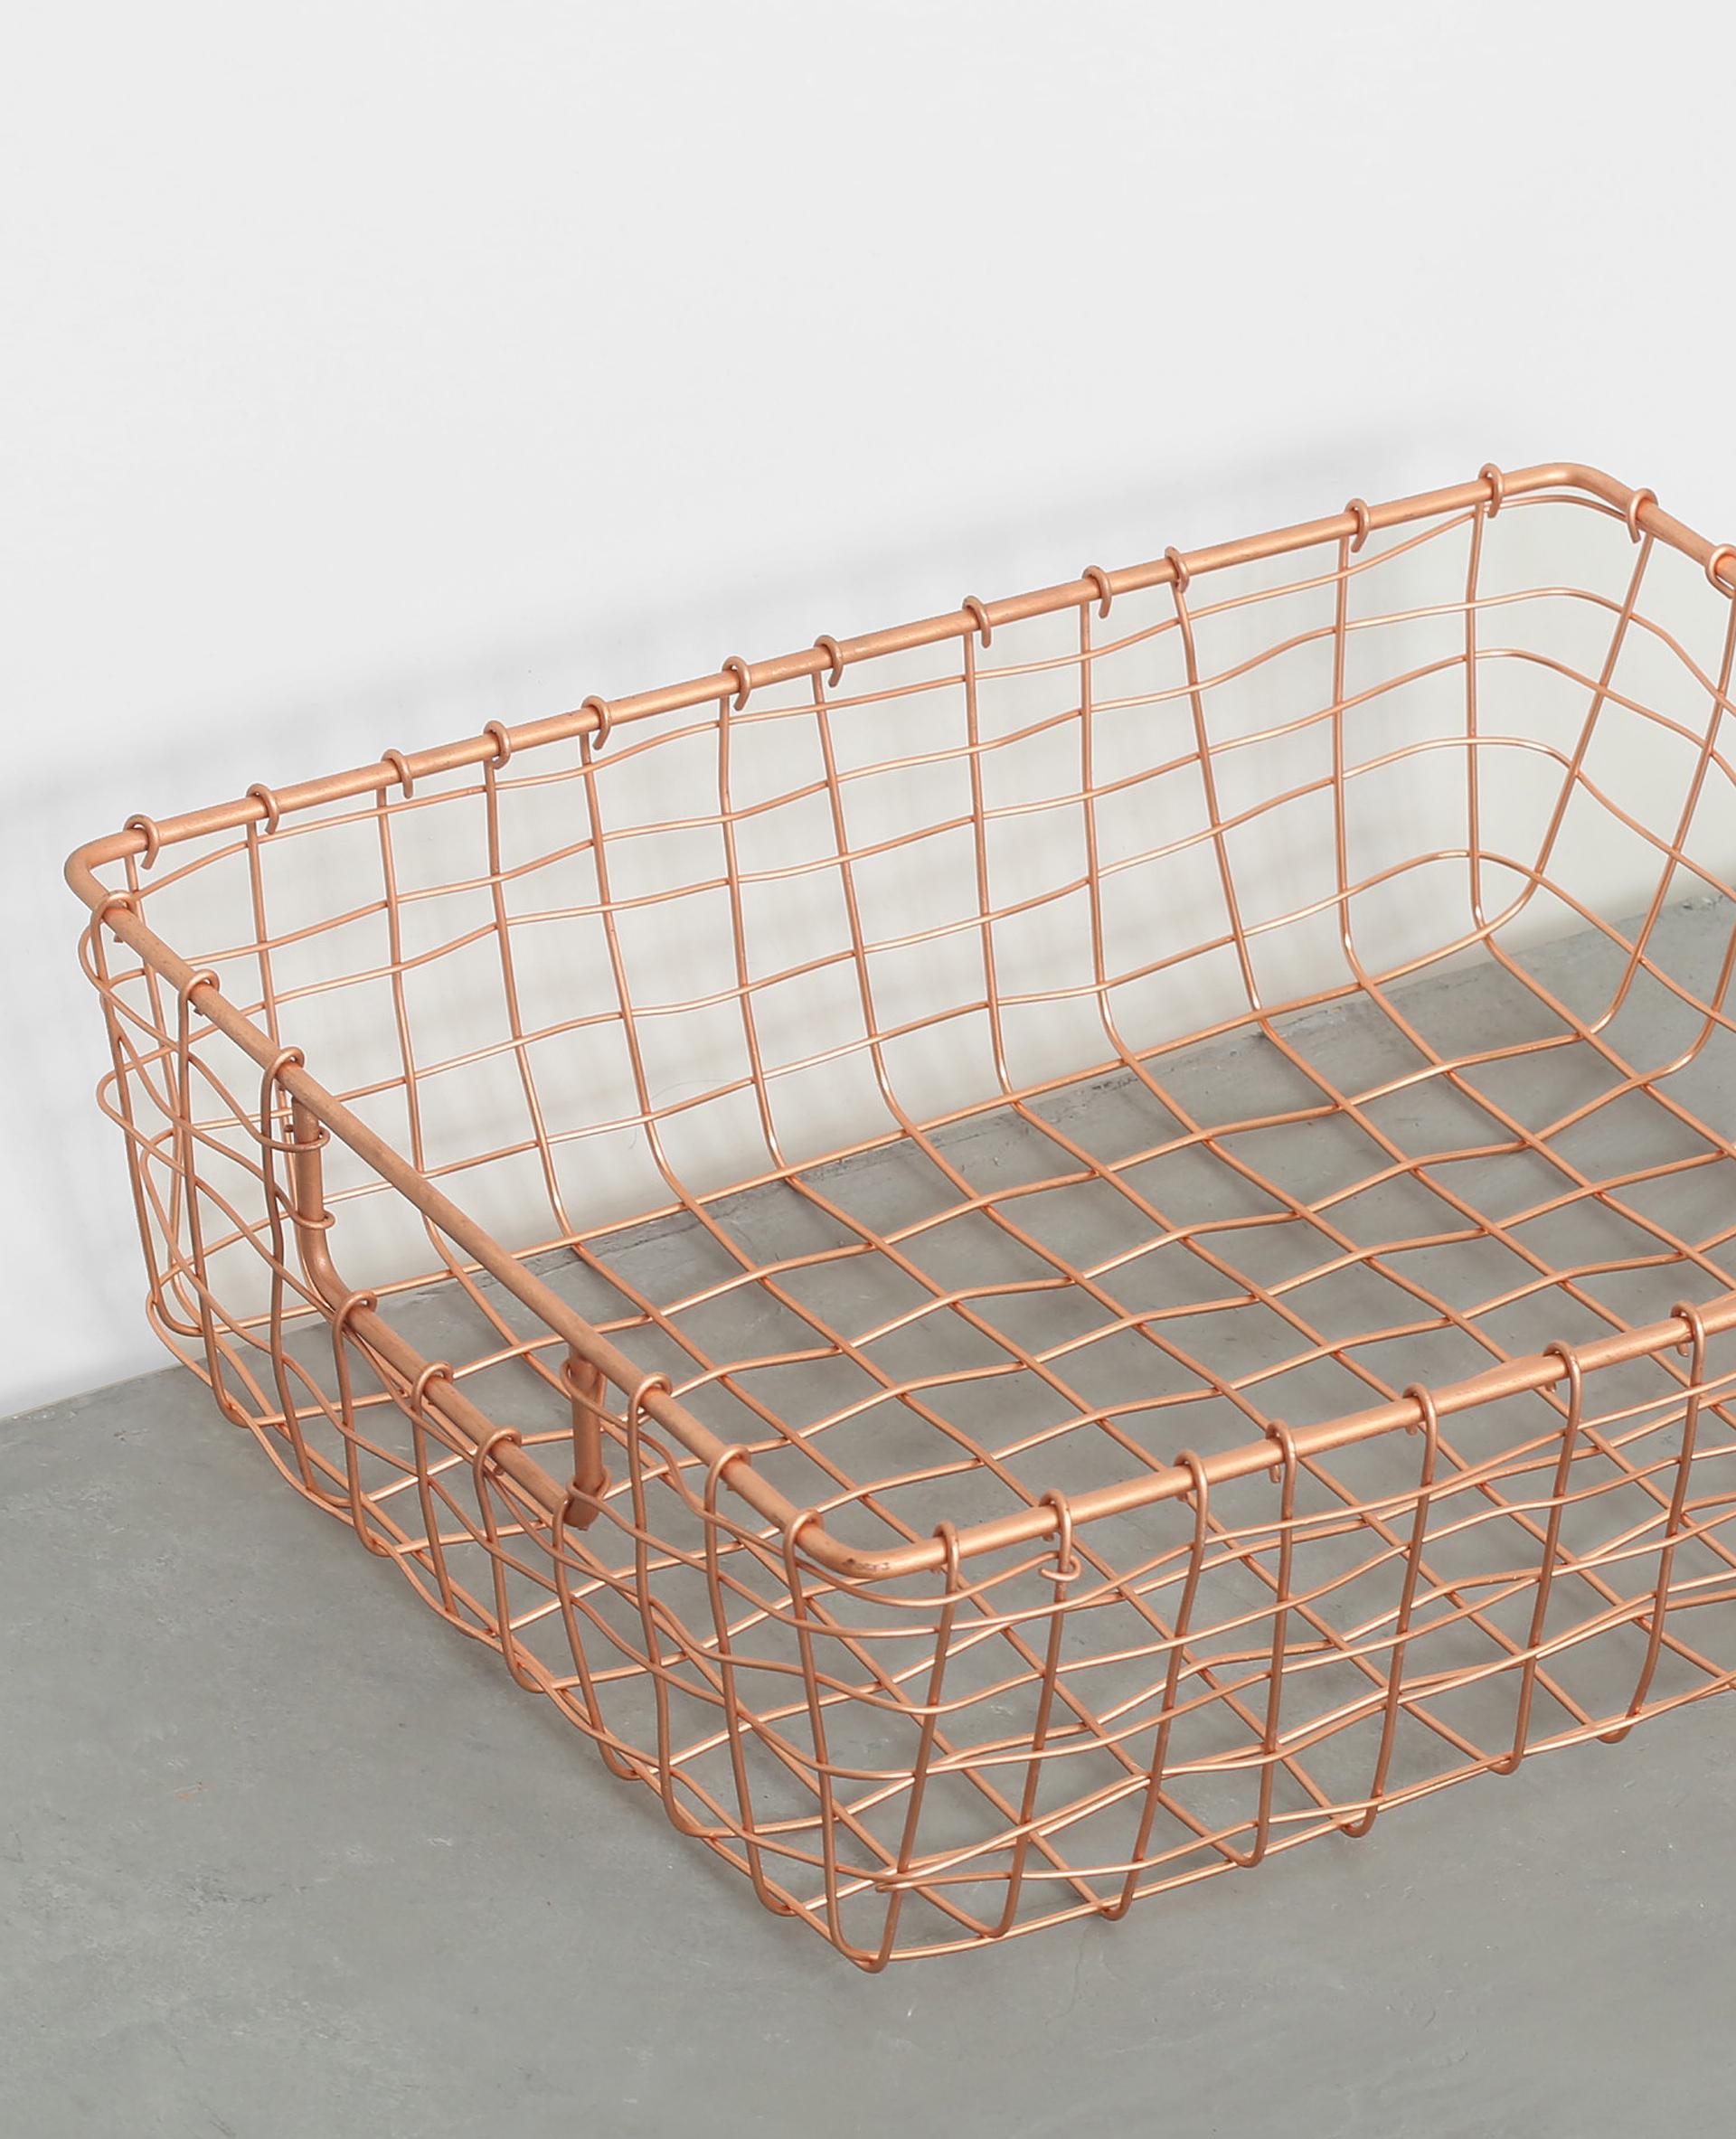 panier grillag cuivr 975086g07a0g pimkie. Black Bedroom Furniture Sets. Home Design Ideas